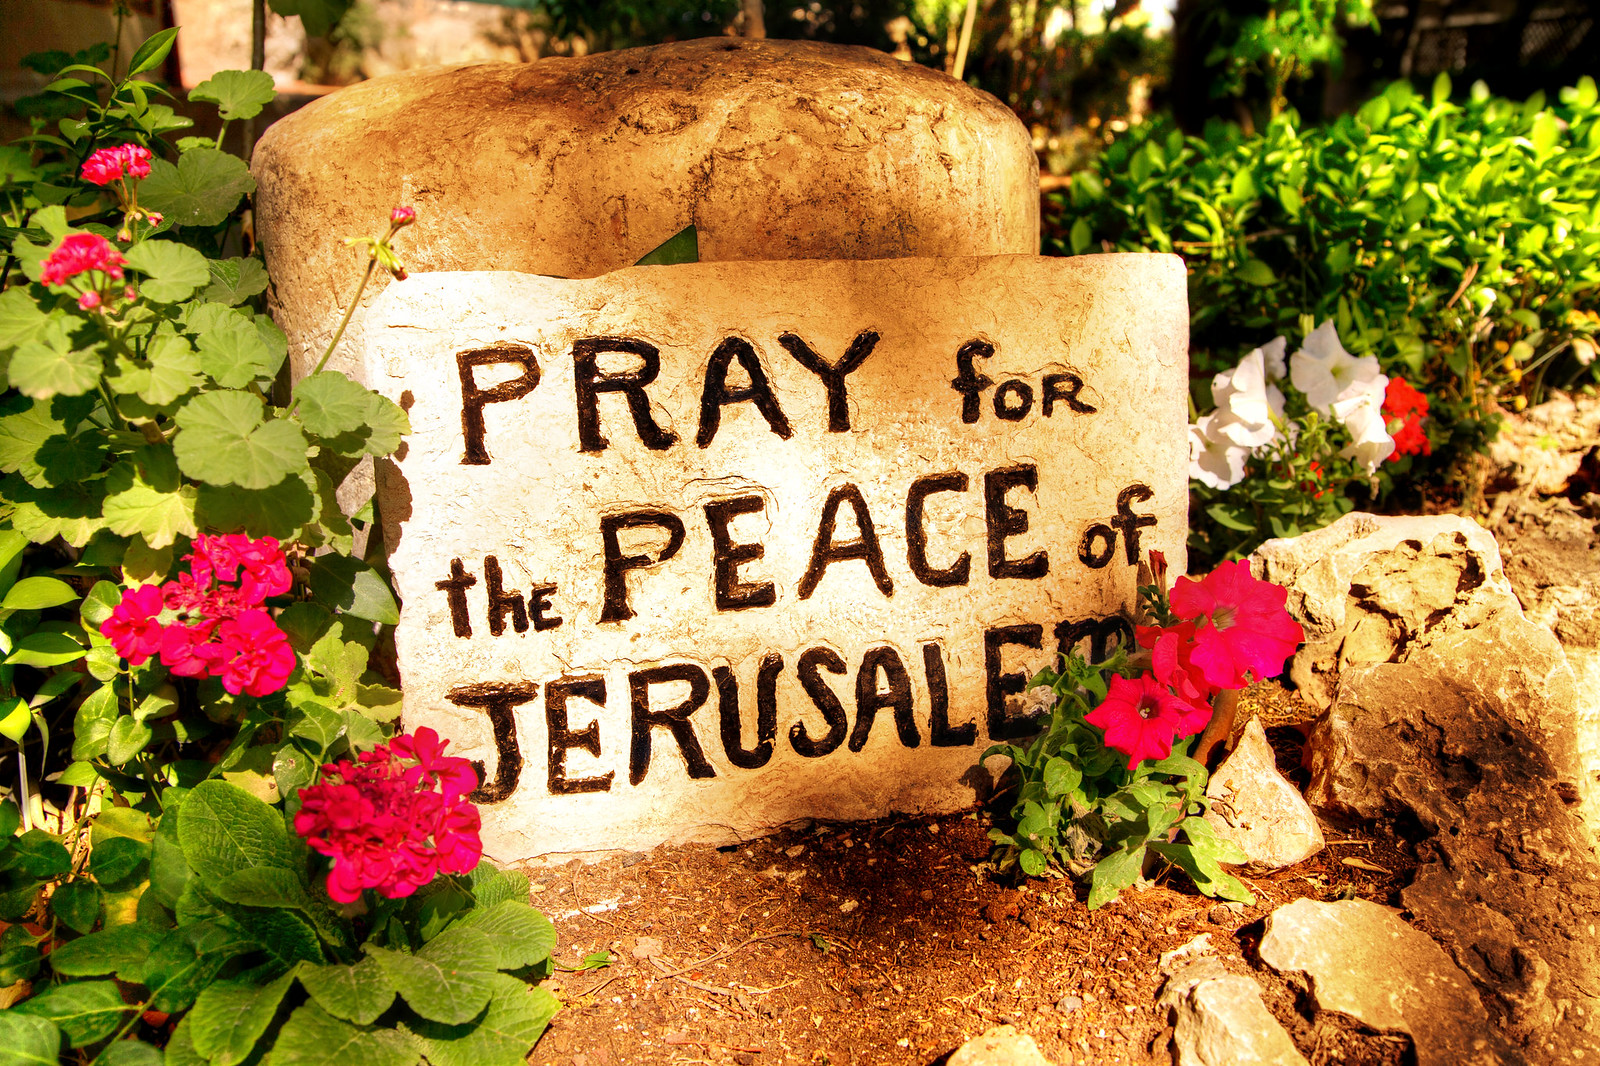 Jerusalem_Garden Tomb 8_Noam Chen_IMOT